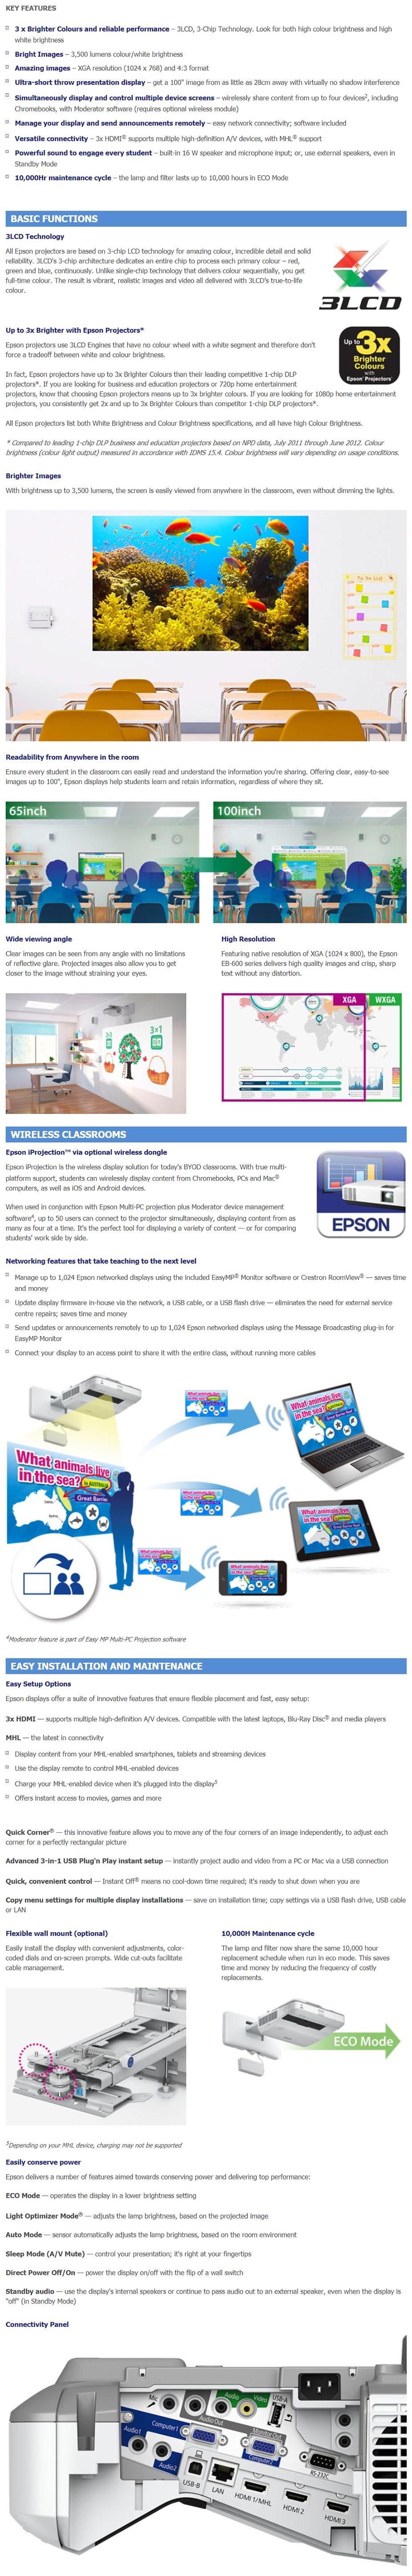 Epson EB-680 XGA 3LCD Ultra Short Throw Data Projector - Desktop Overview 1